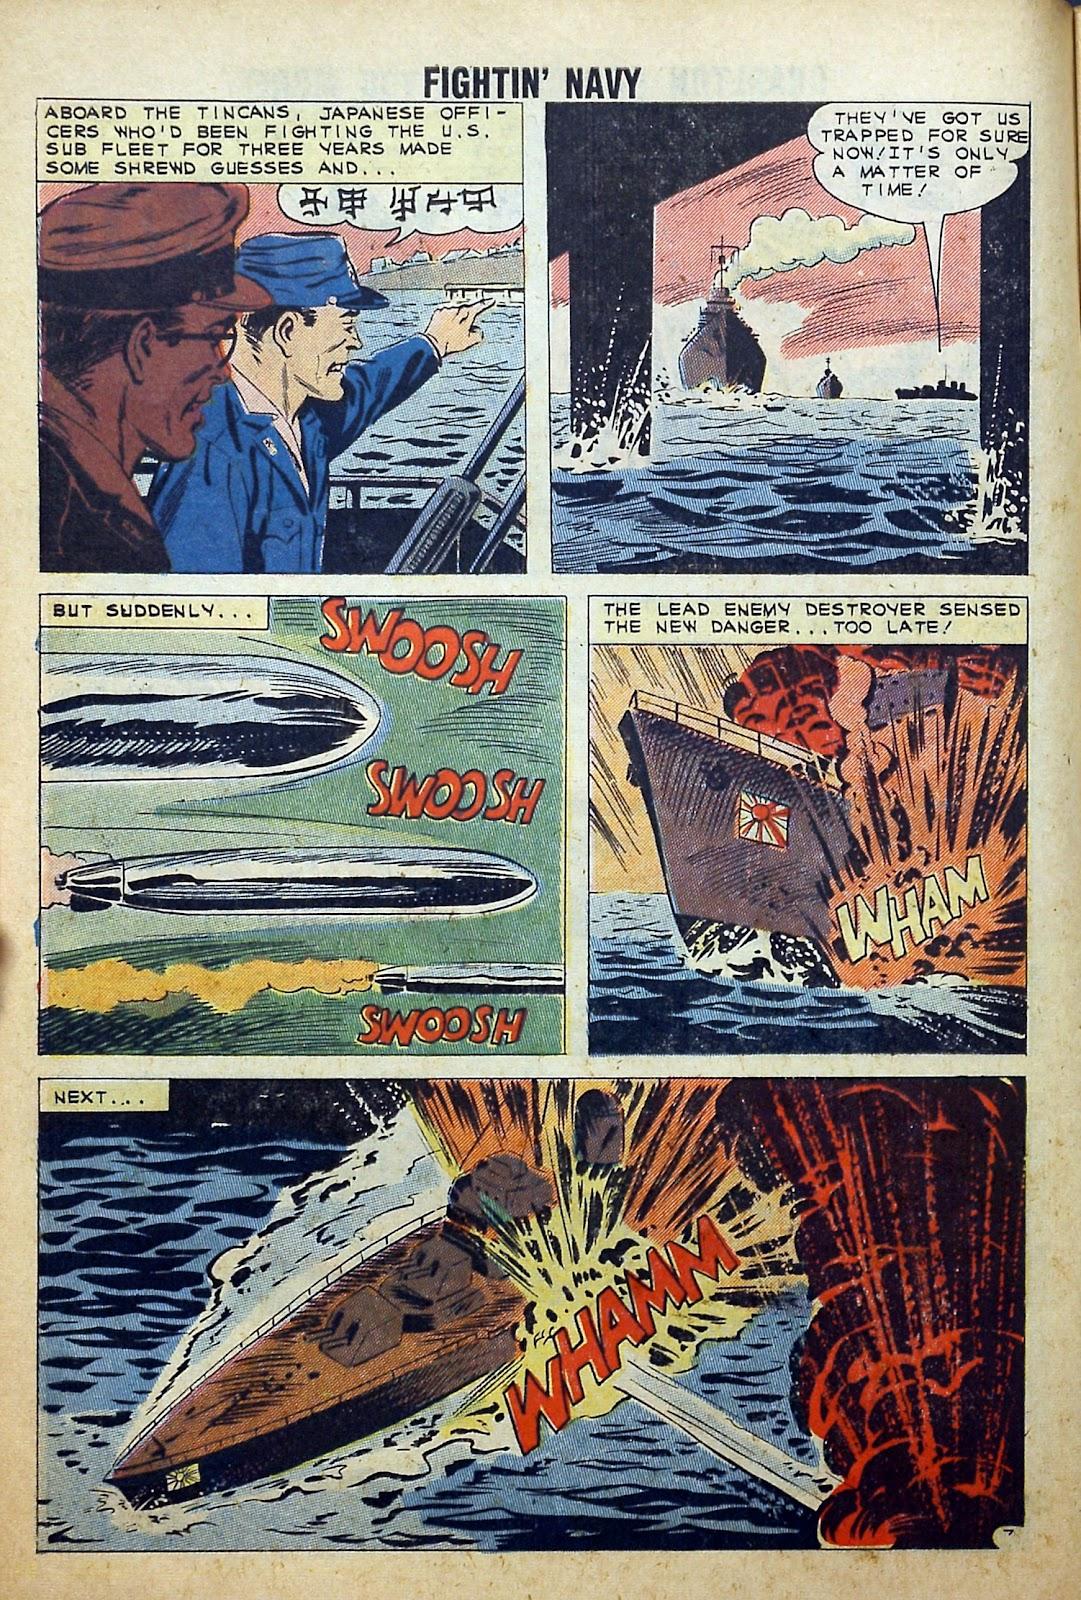 Read online Fightin' Navy comic -  Issue #99 - 10